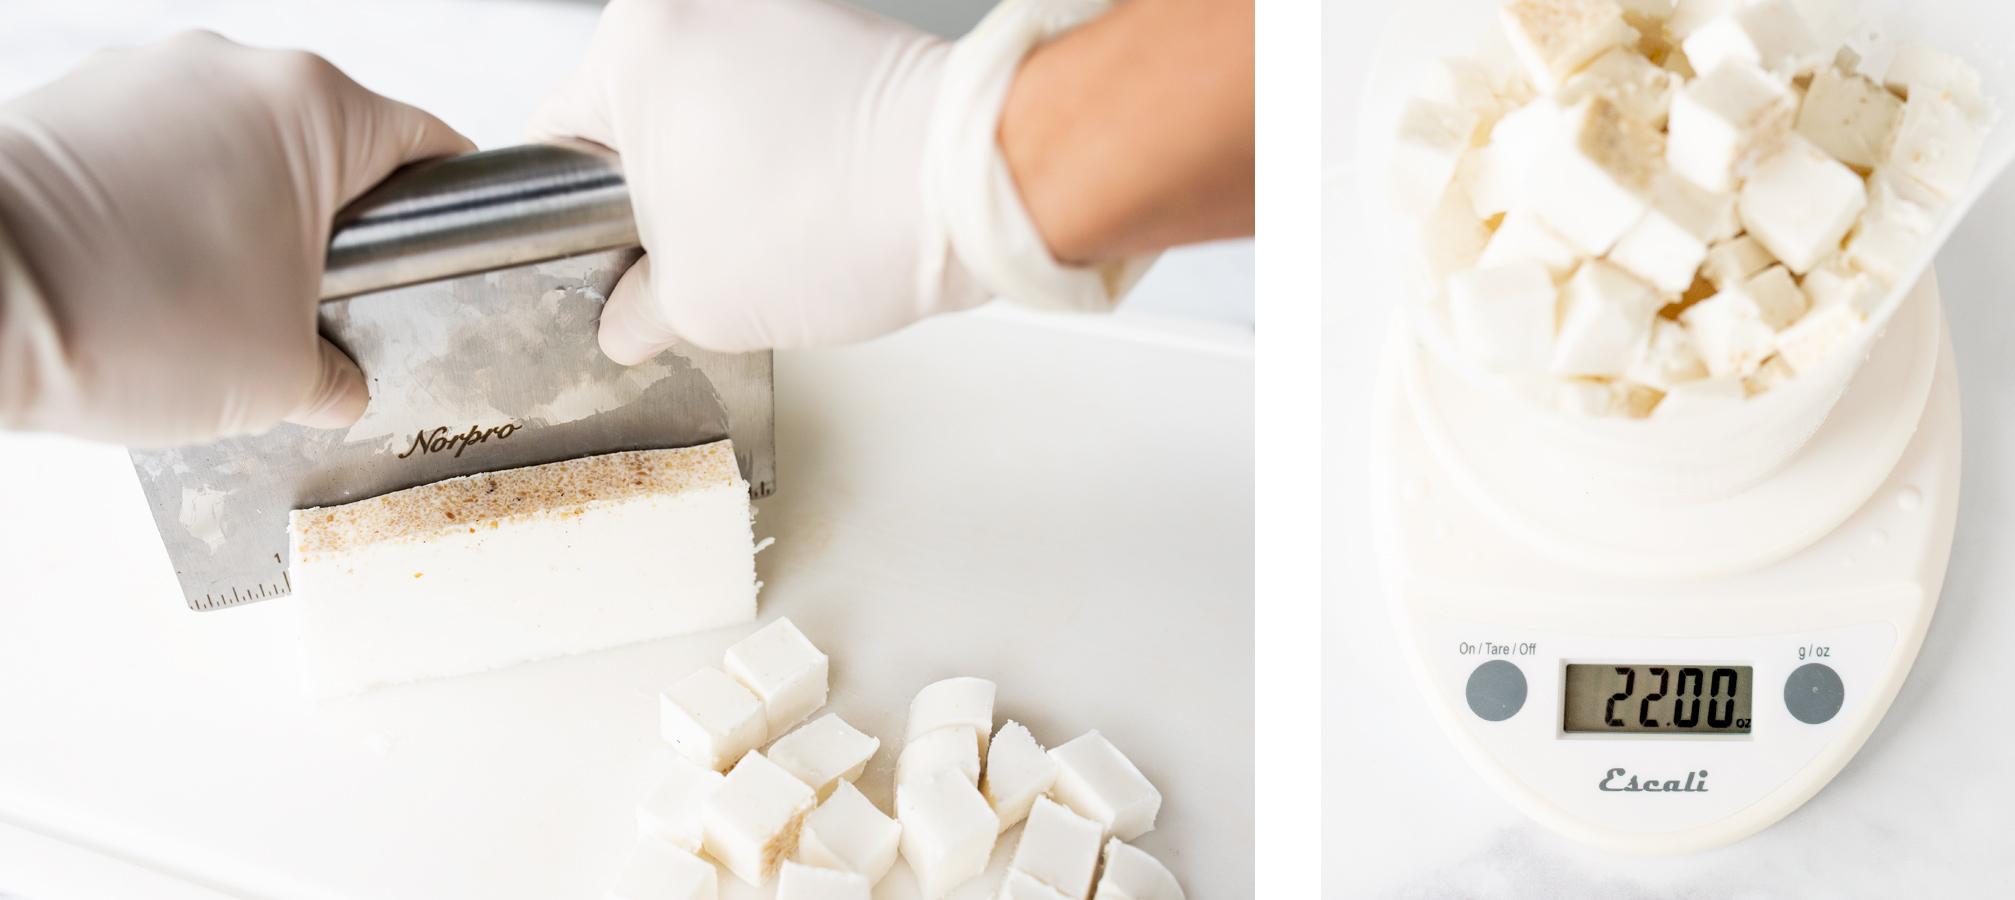 Cutting oatmeal shea soap base and weighing it.